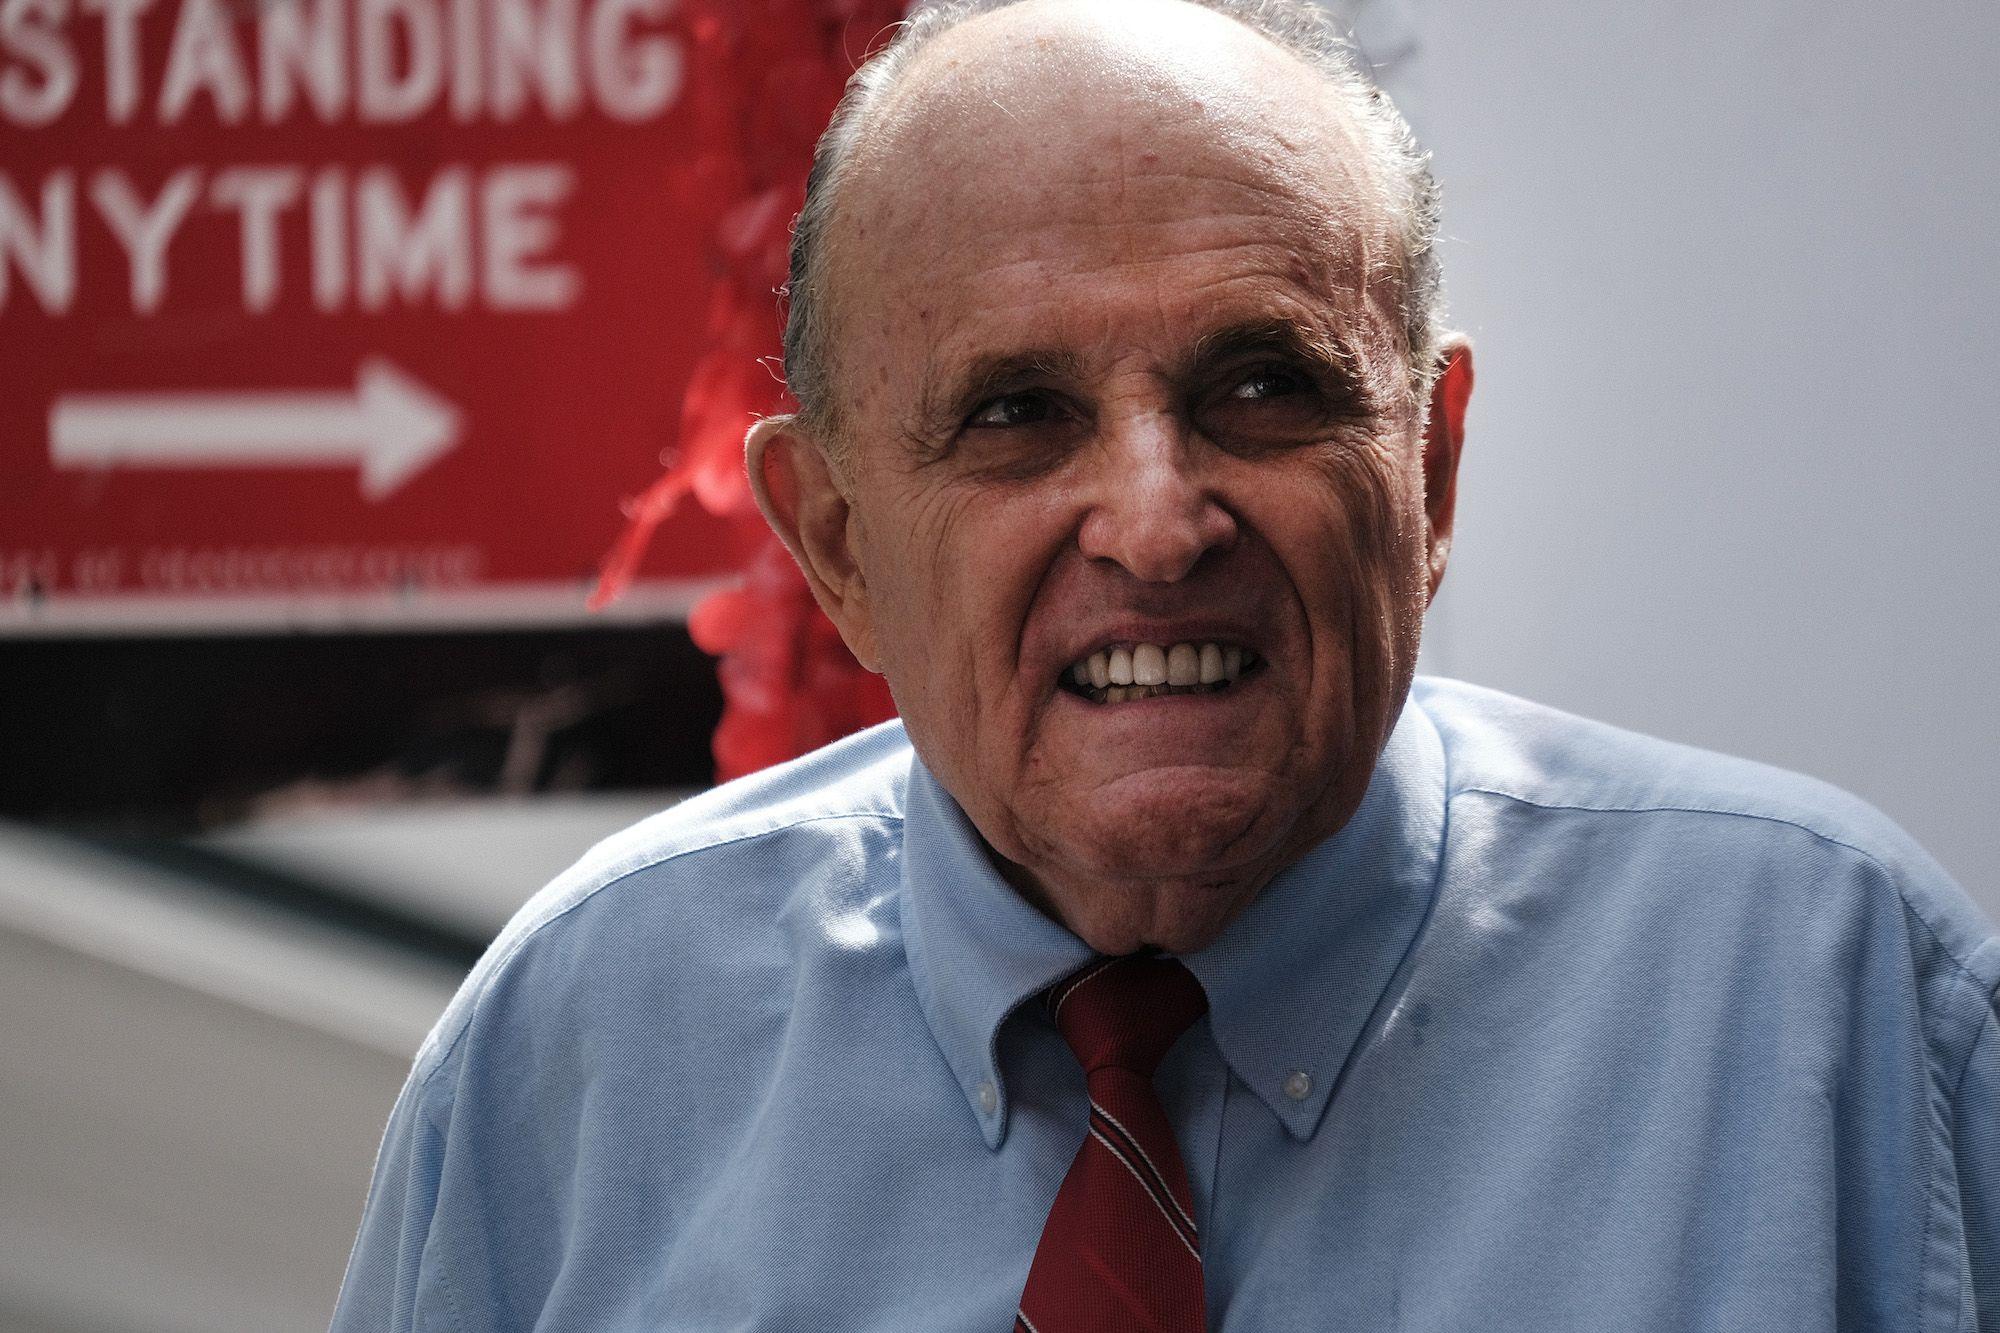 How Long Until We Hear Rudy Was Just a Coffee Boy?